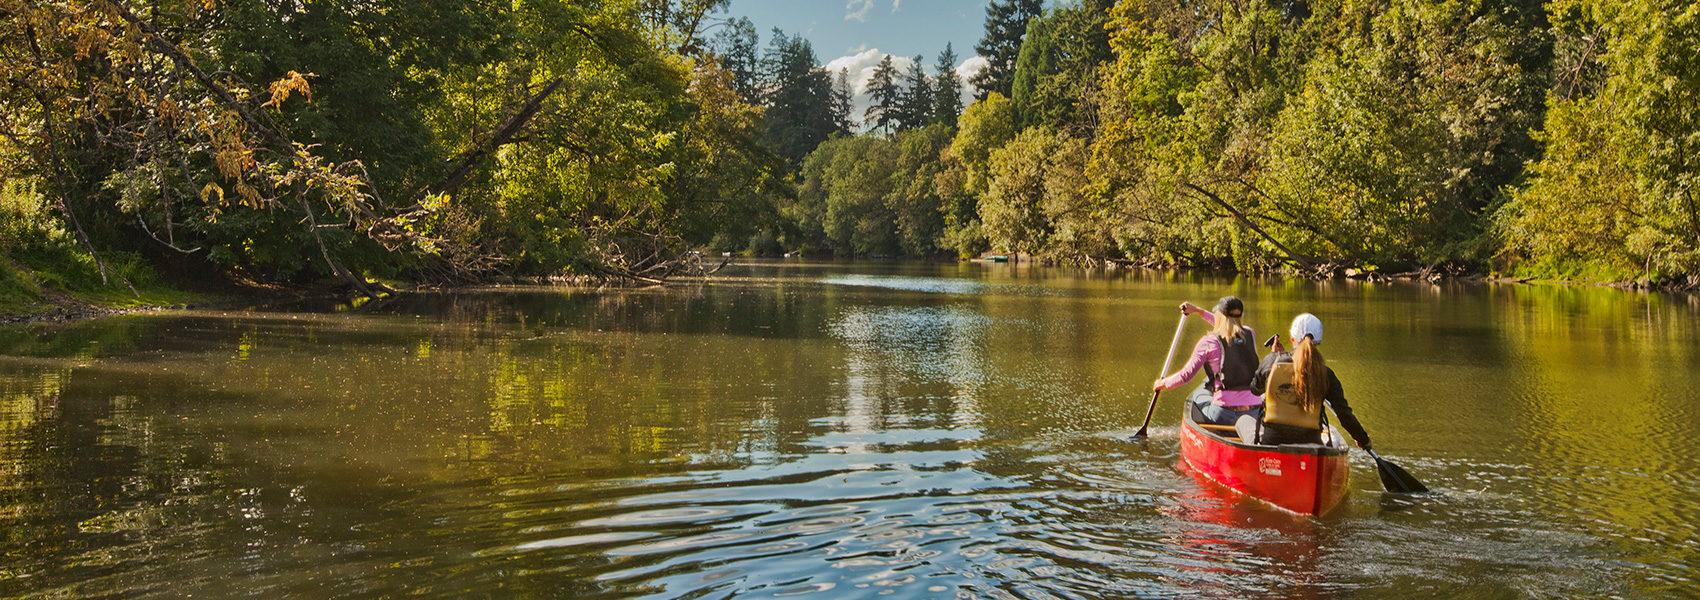 Tualatin River Canoe - Home Carousel 1700 x 600